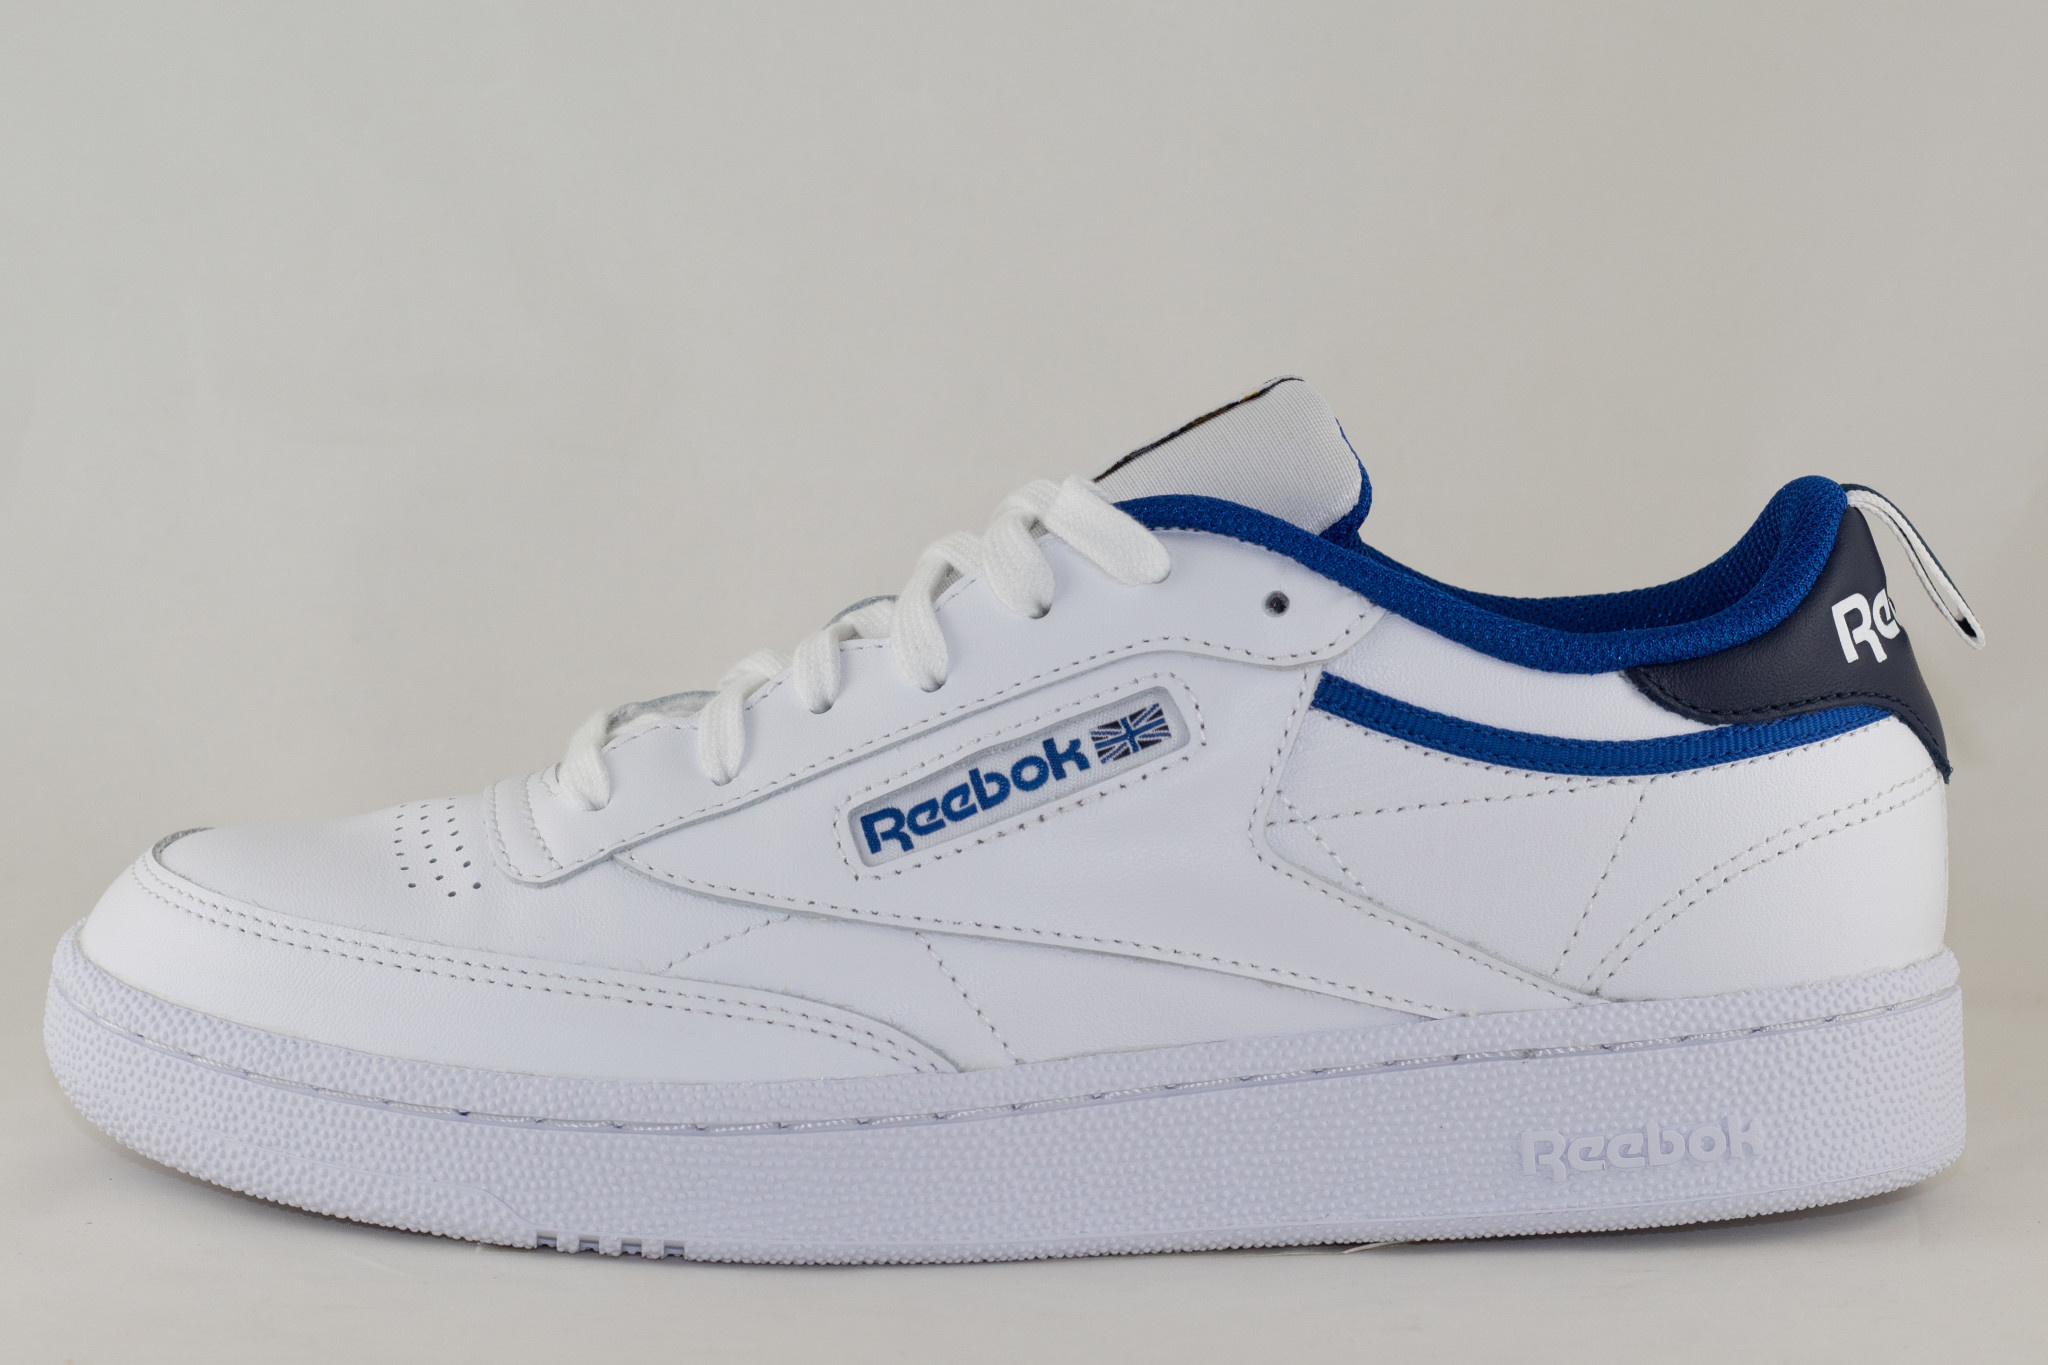 REEBOK M REEBOK CLUB C 85 Vecblu/ Conavy/White